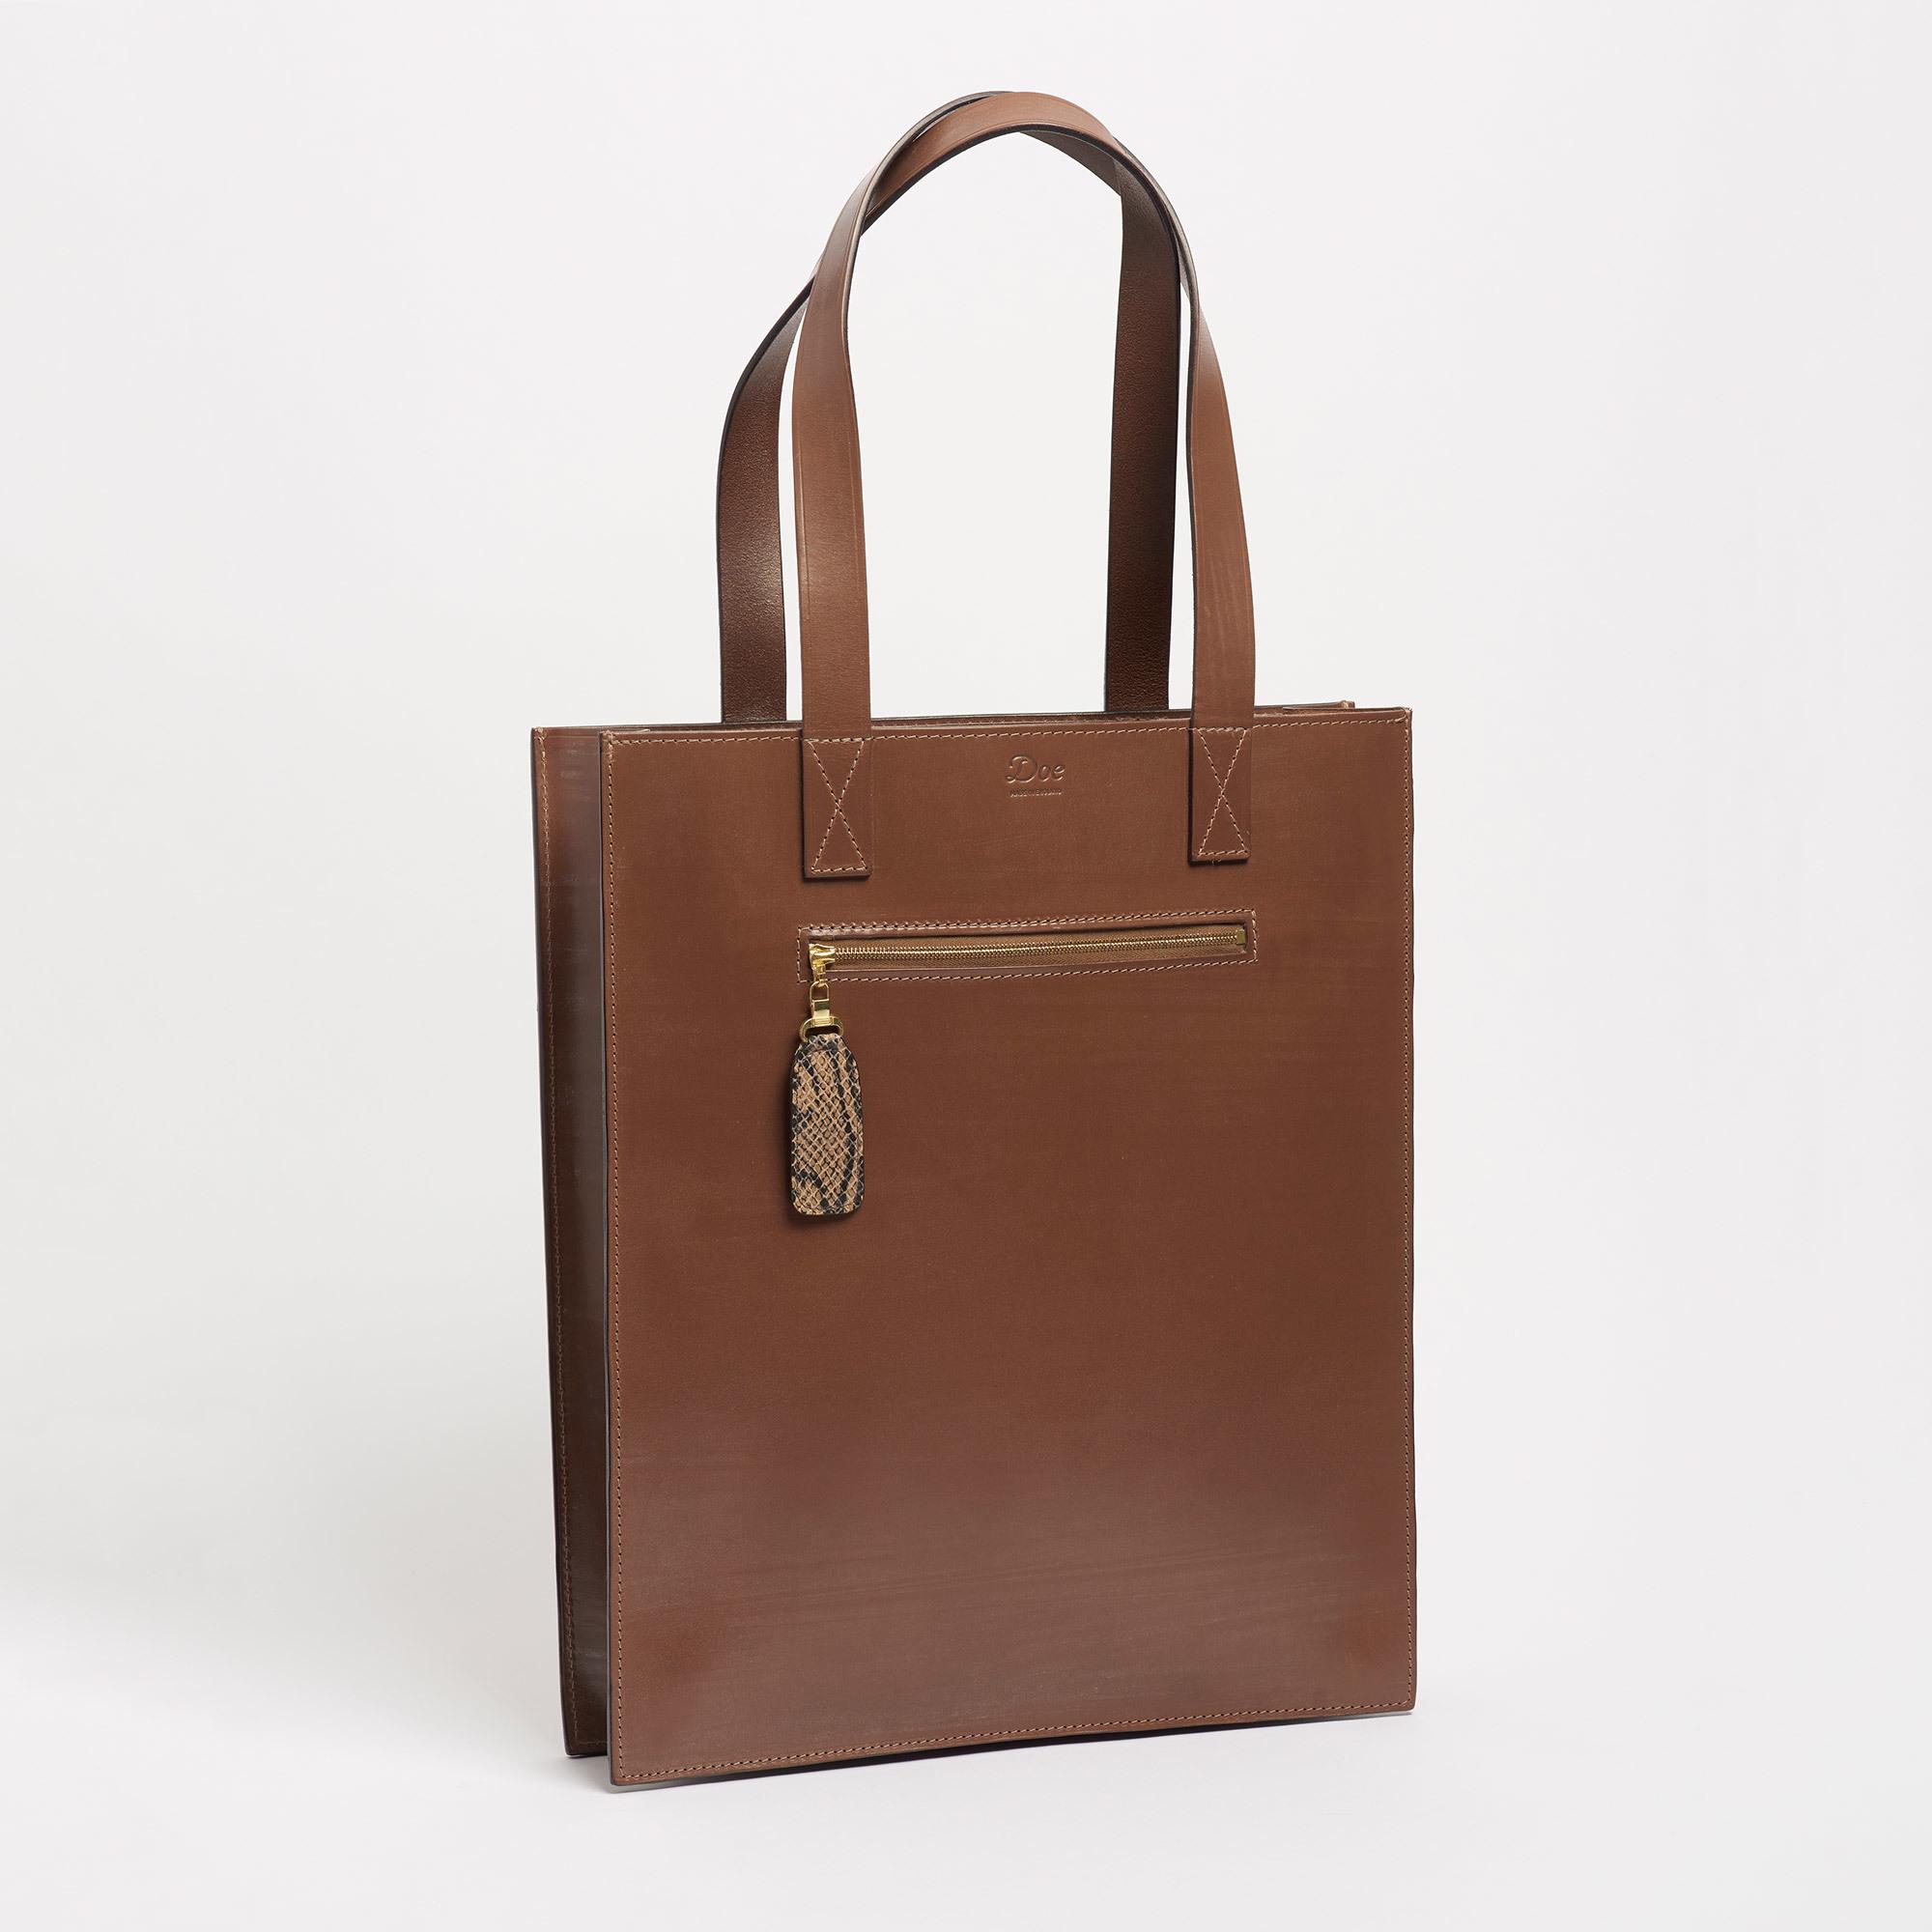 Bridle Hide Brown Leather Tote Bag